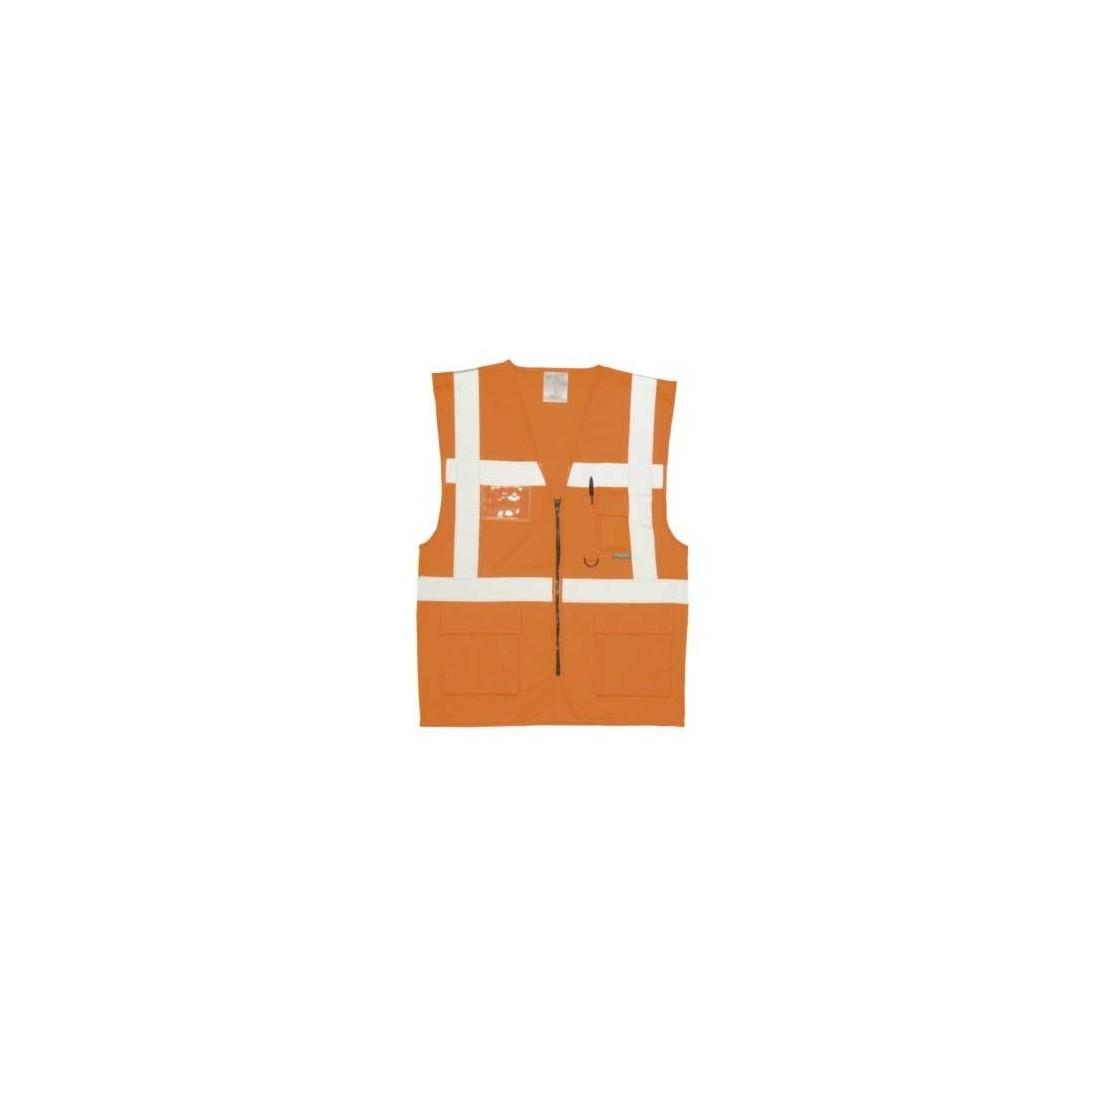 Chaleco executive malla alta visibilidad  s 476